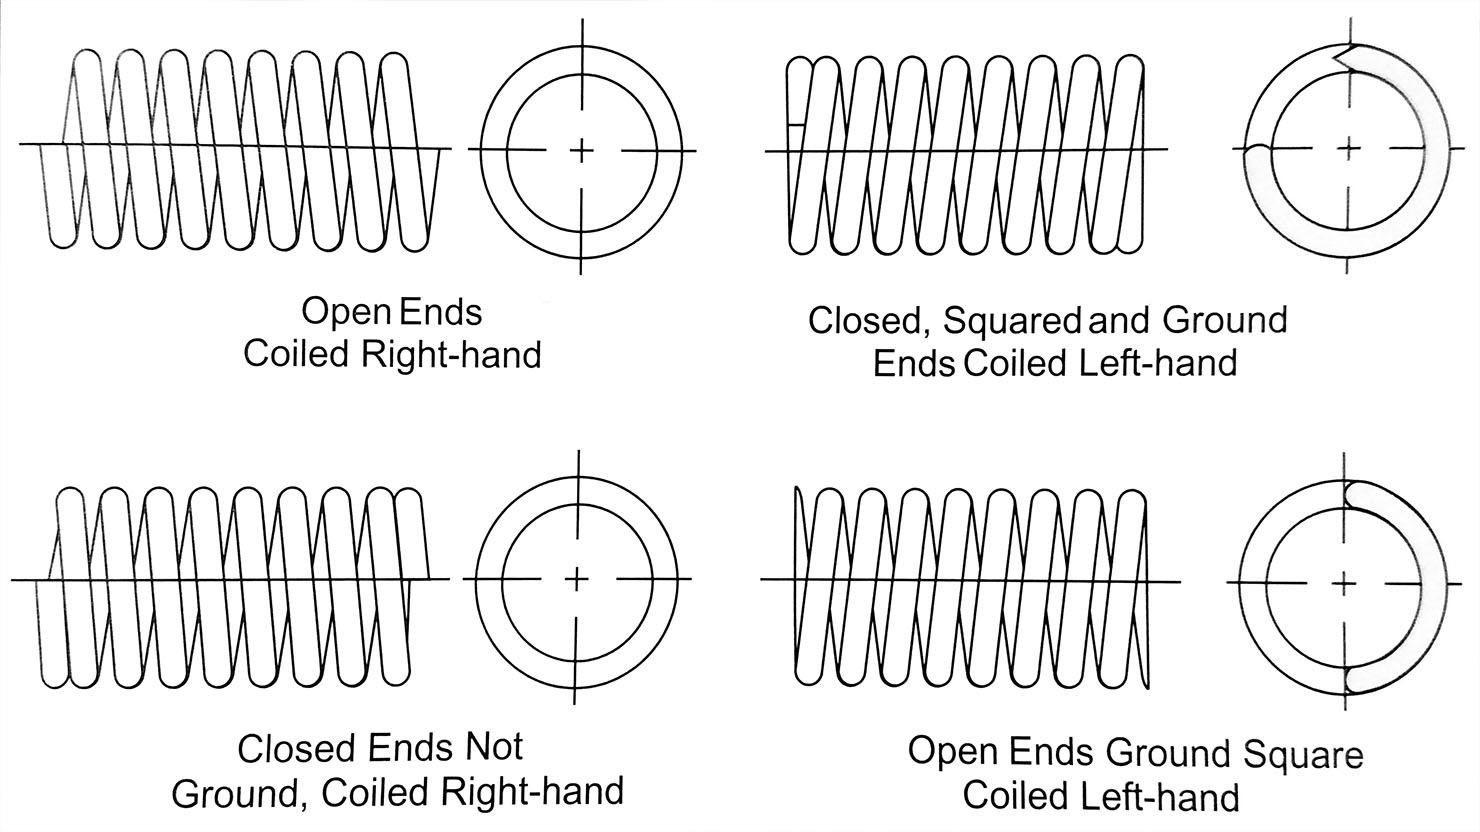 2011 Ford F 250 Ke Light Wiring Diagram. Ford. Auto Wiring